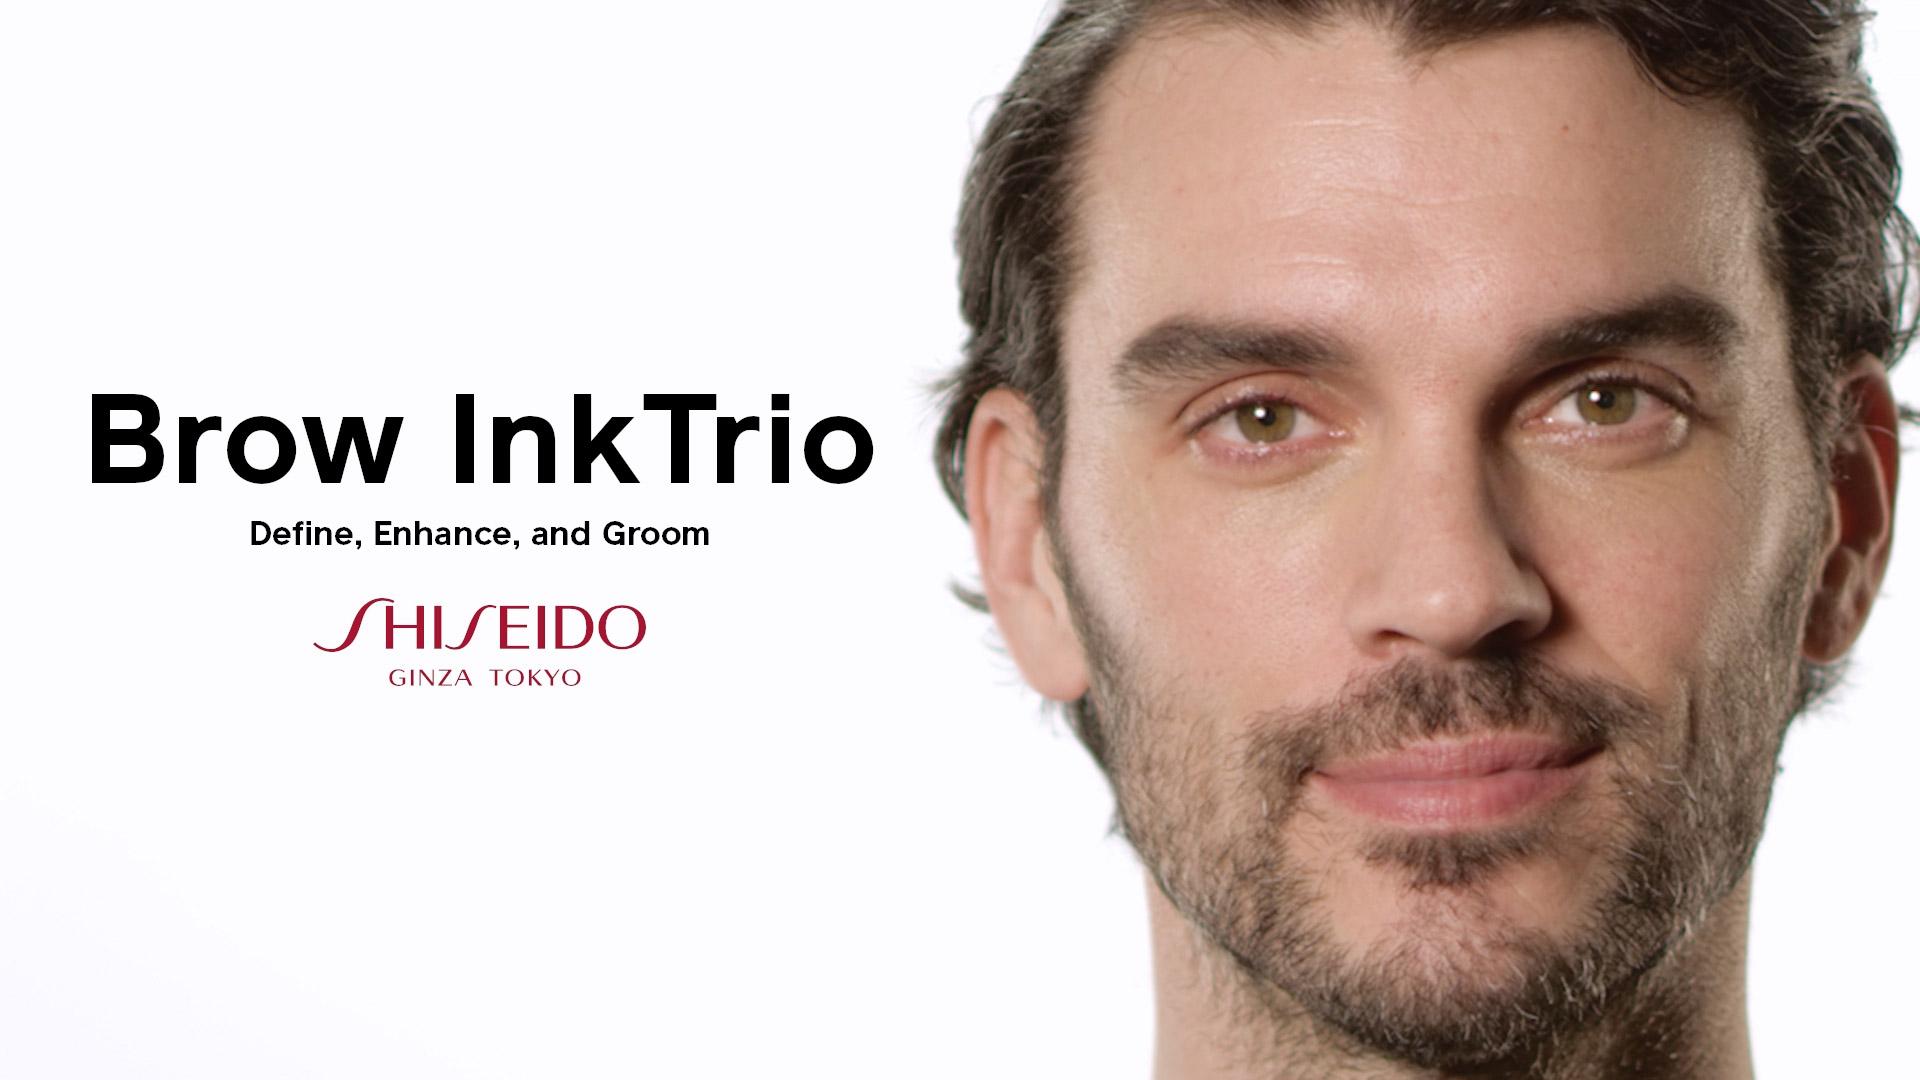 Brow InkTrio